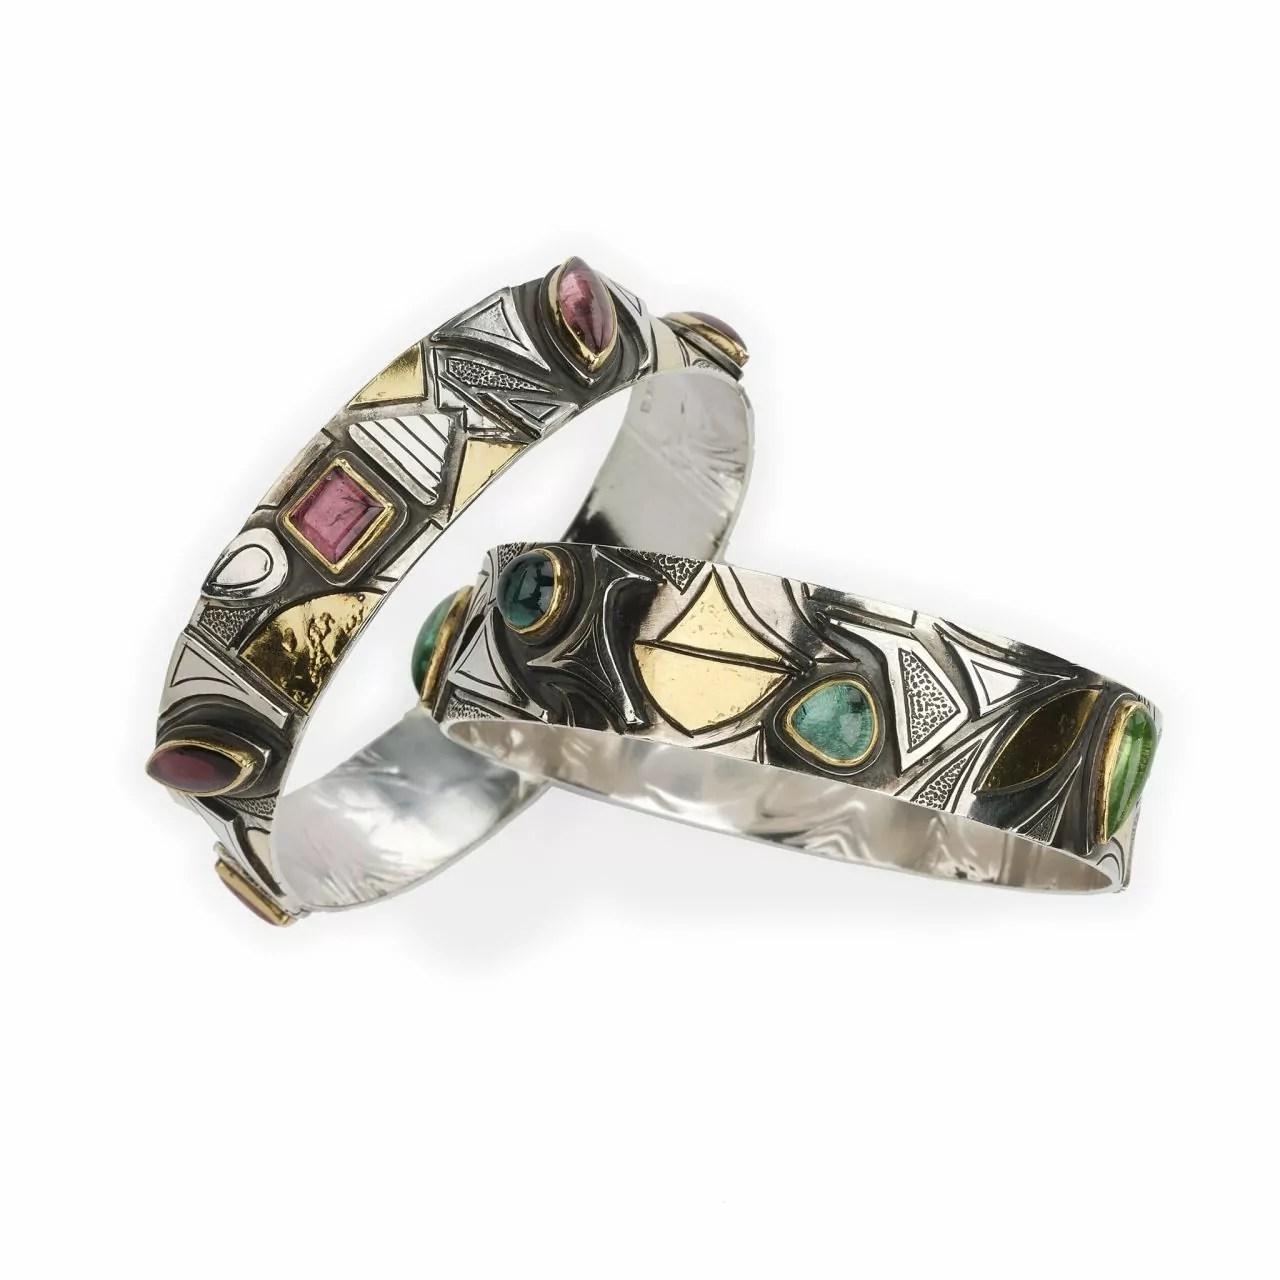 Bracelets with Tourmalines